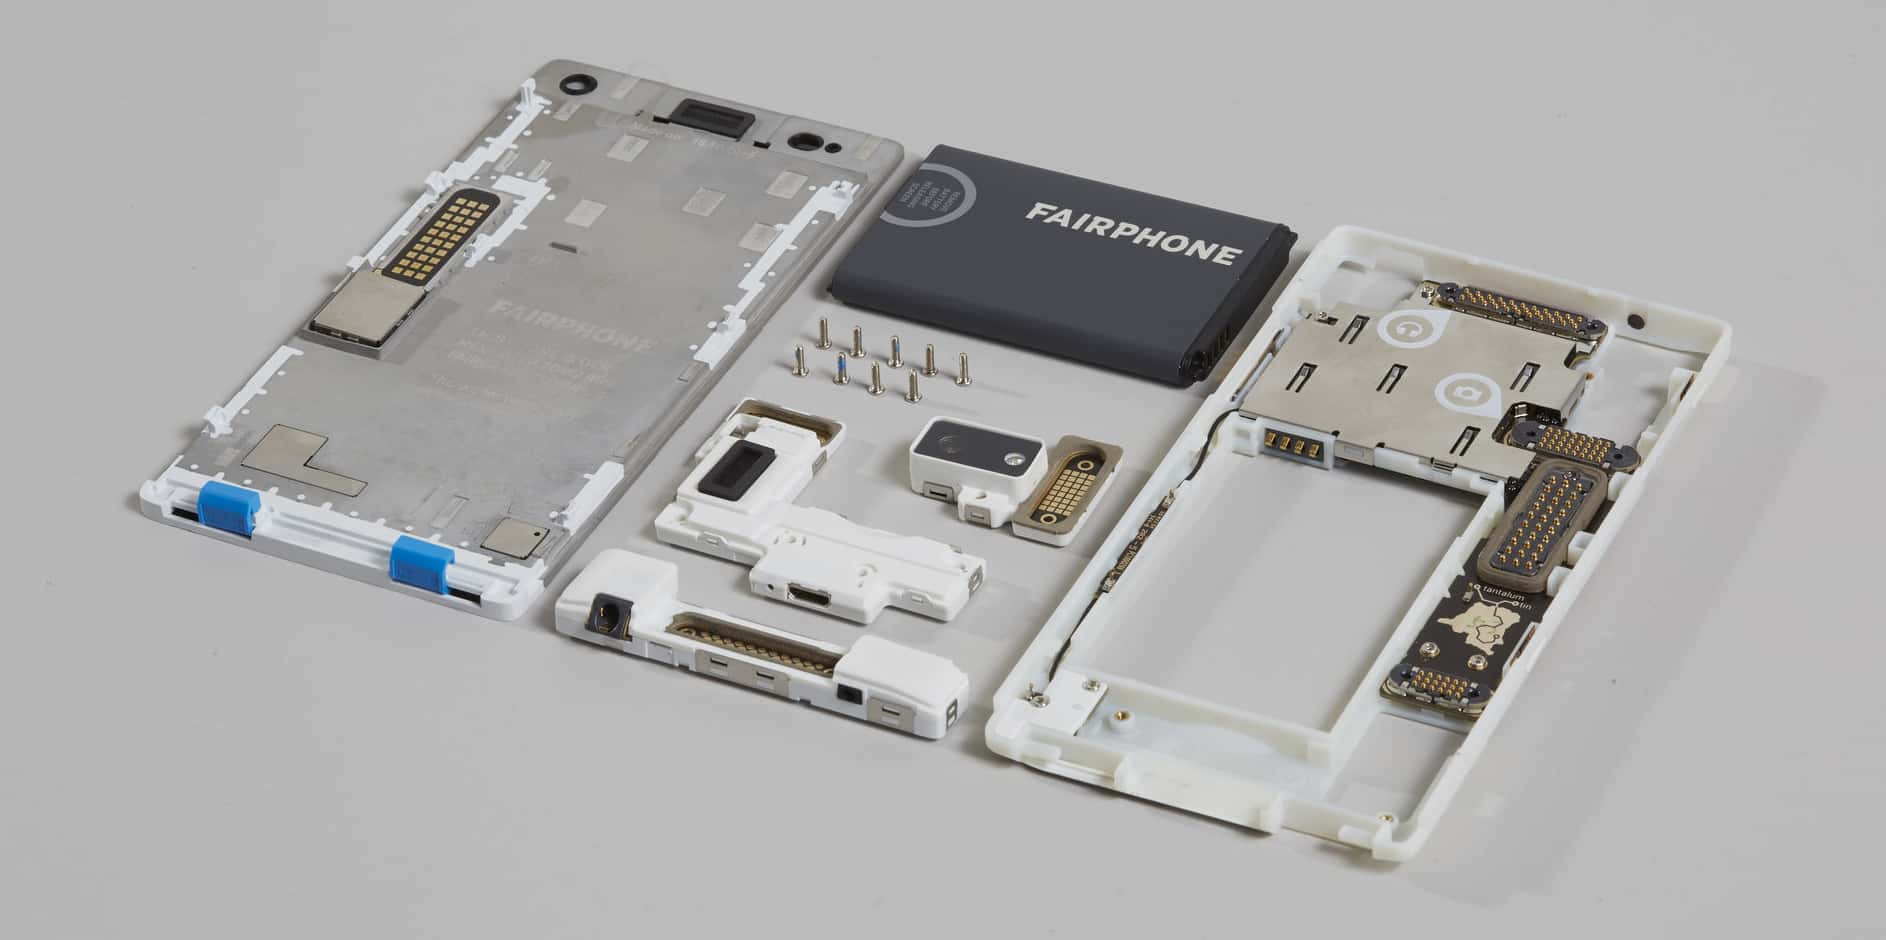 FAIRPHONE: modulares Design